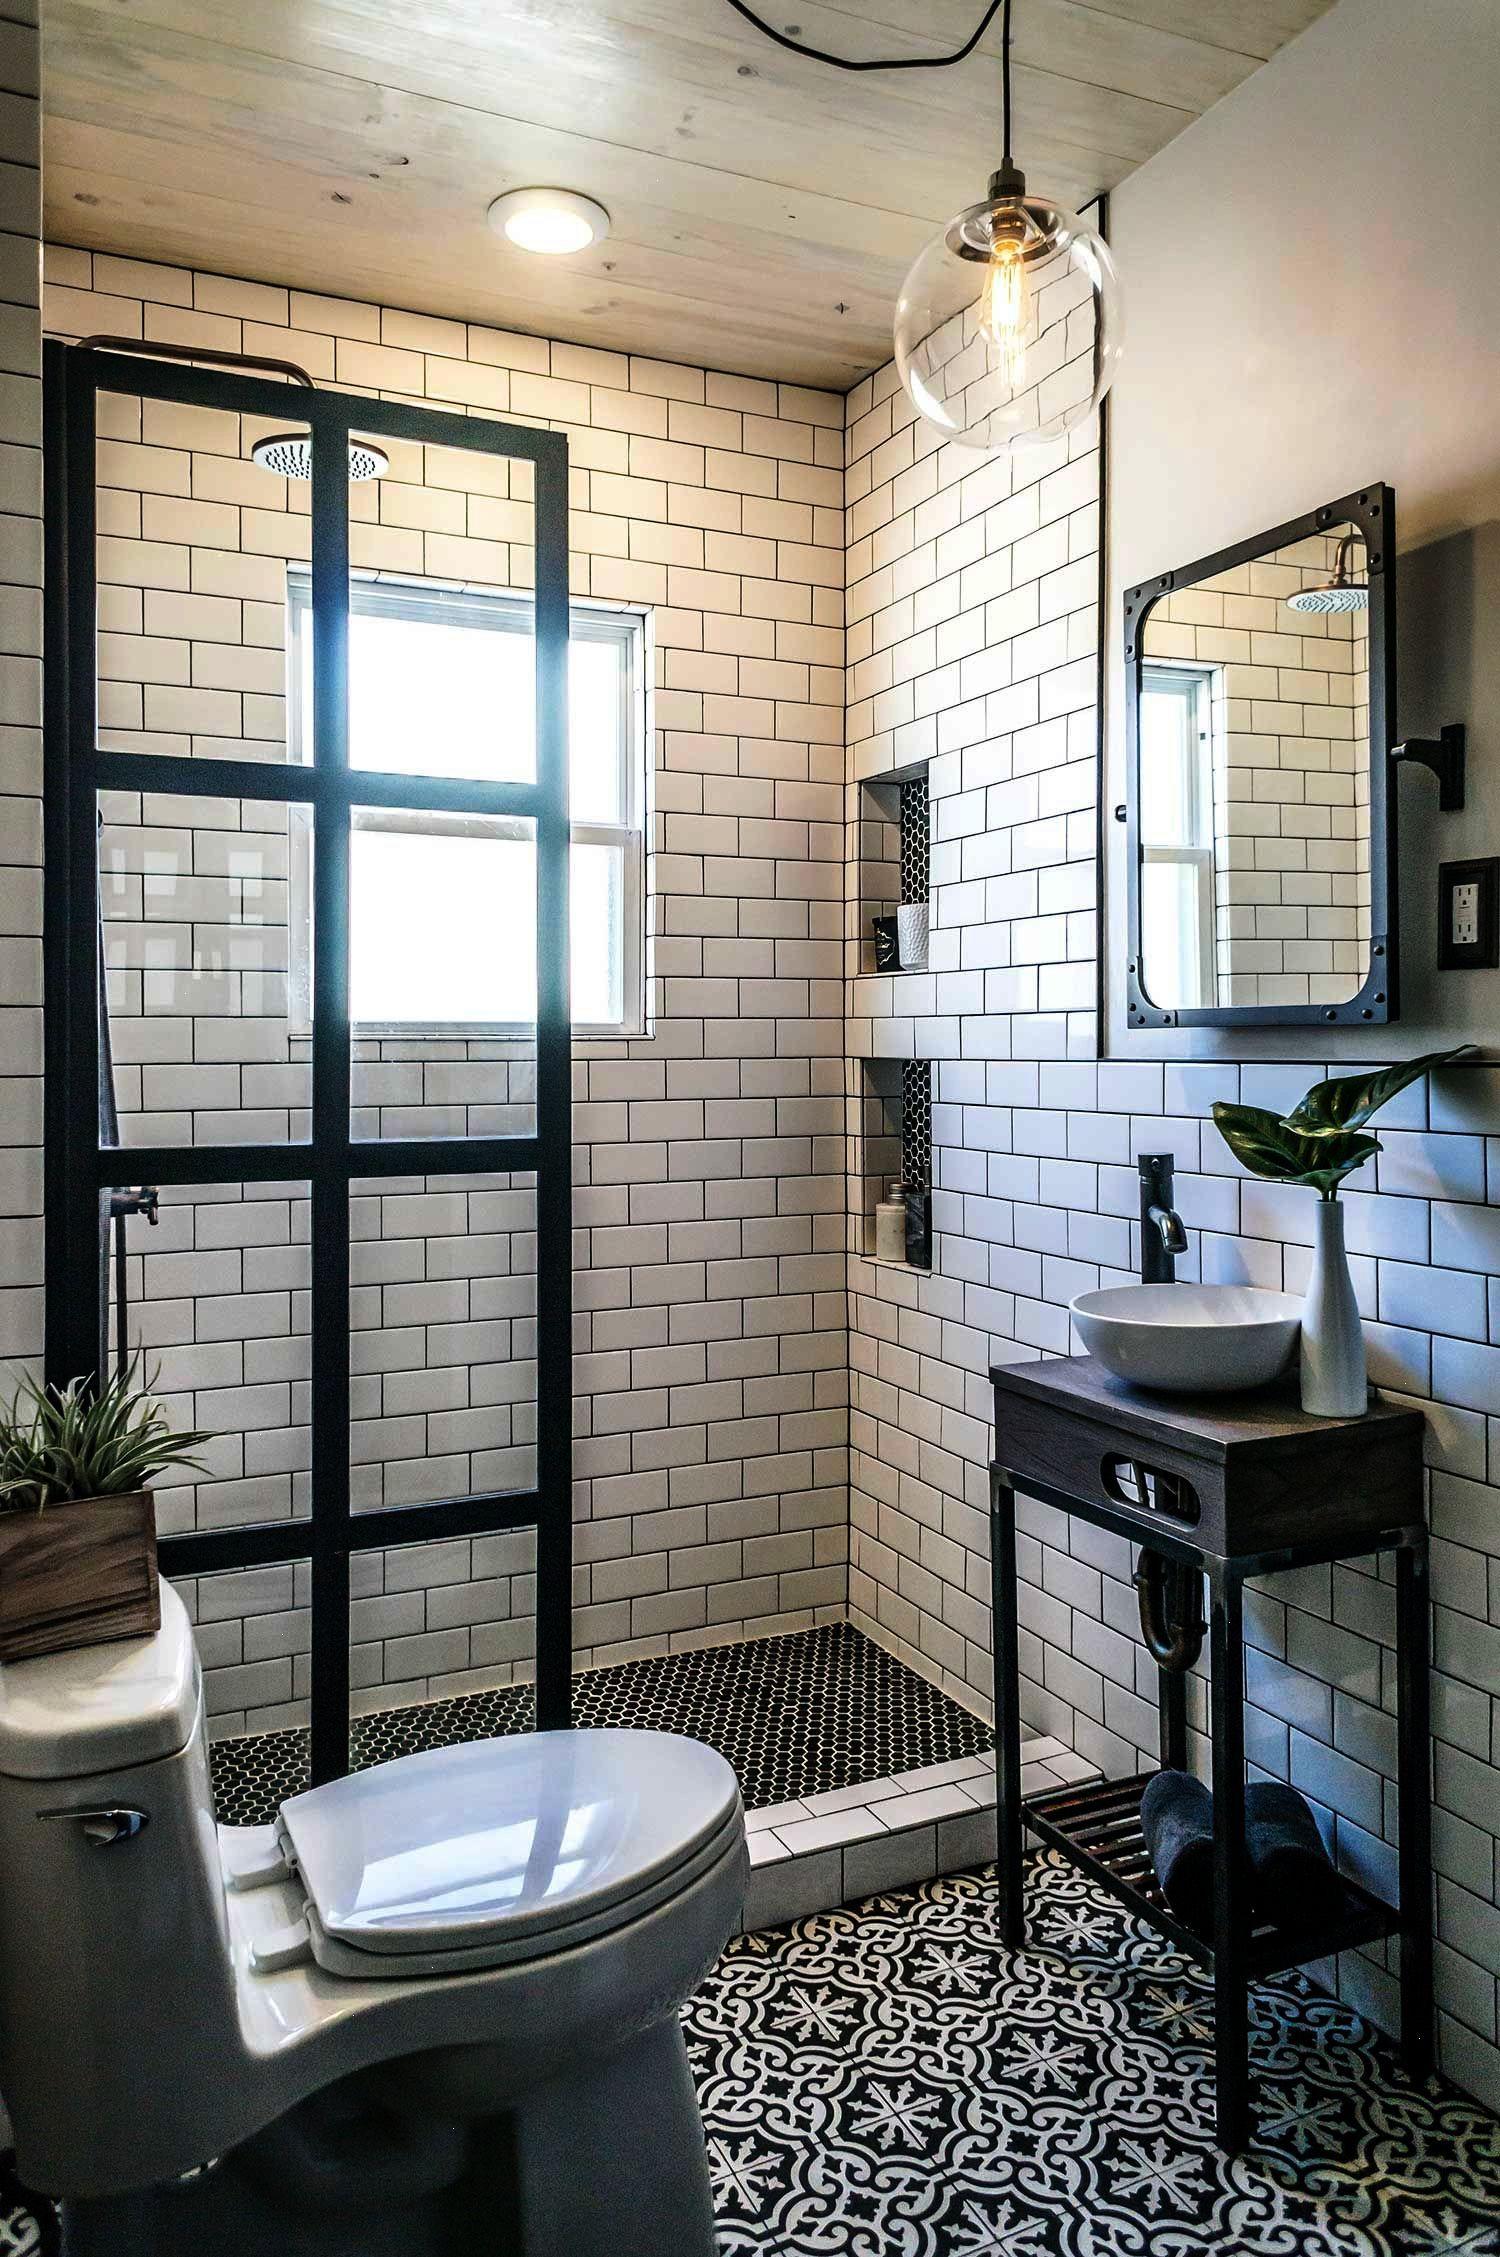 Interesting   Bathroom Decor Sets Pinterest?